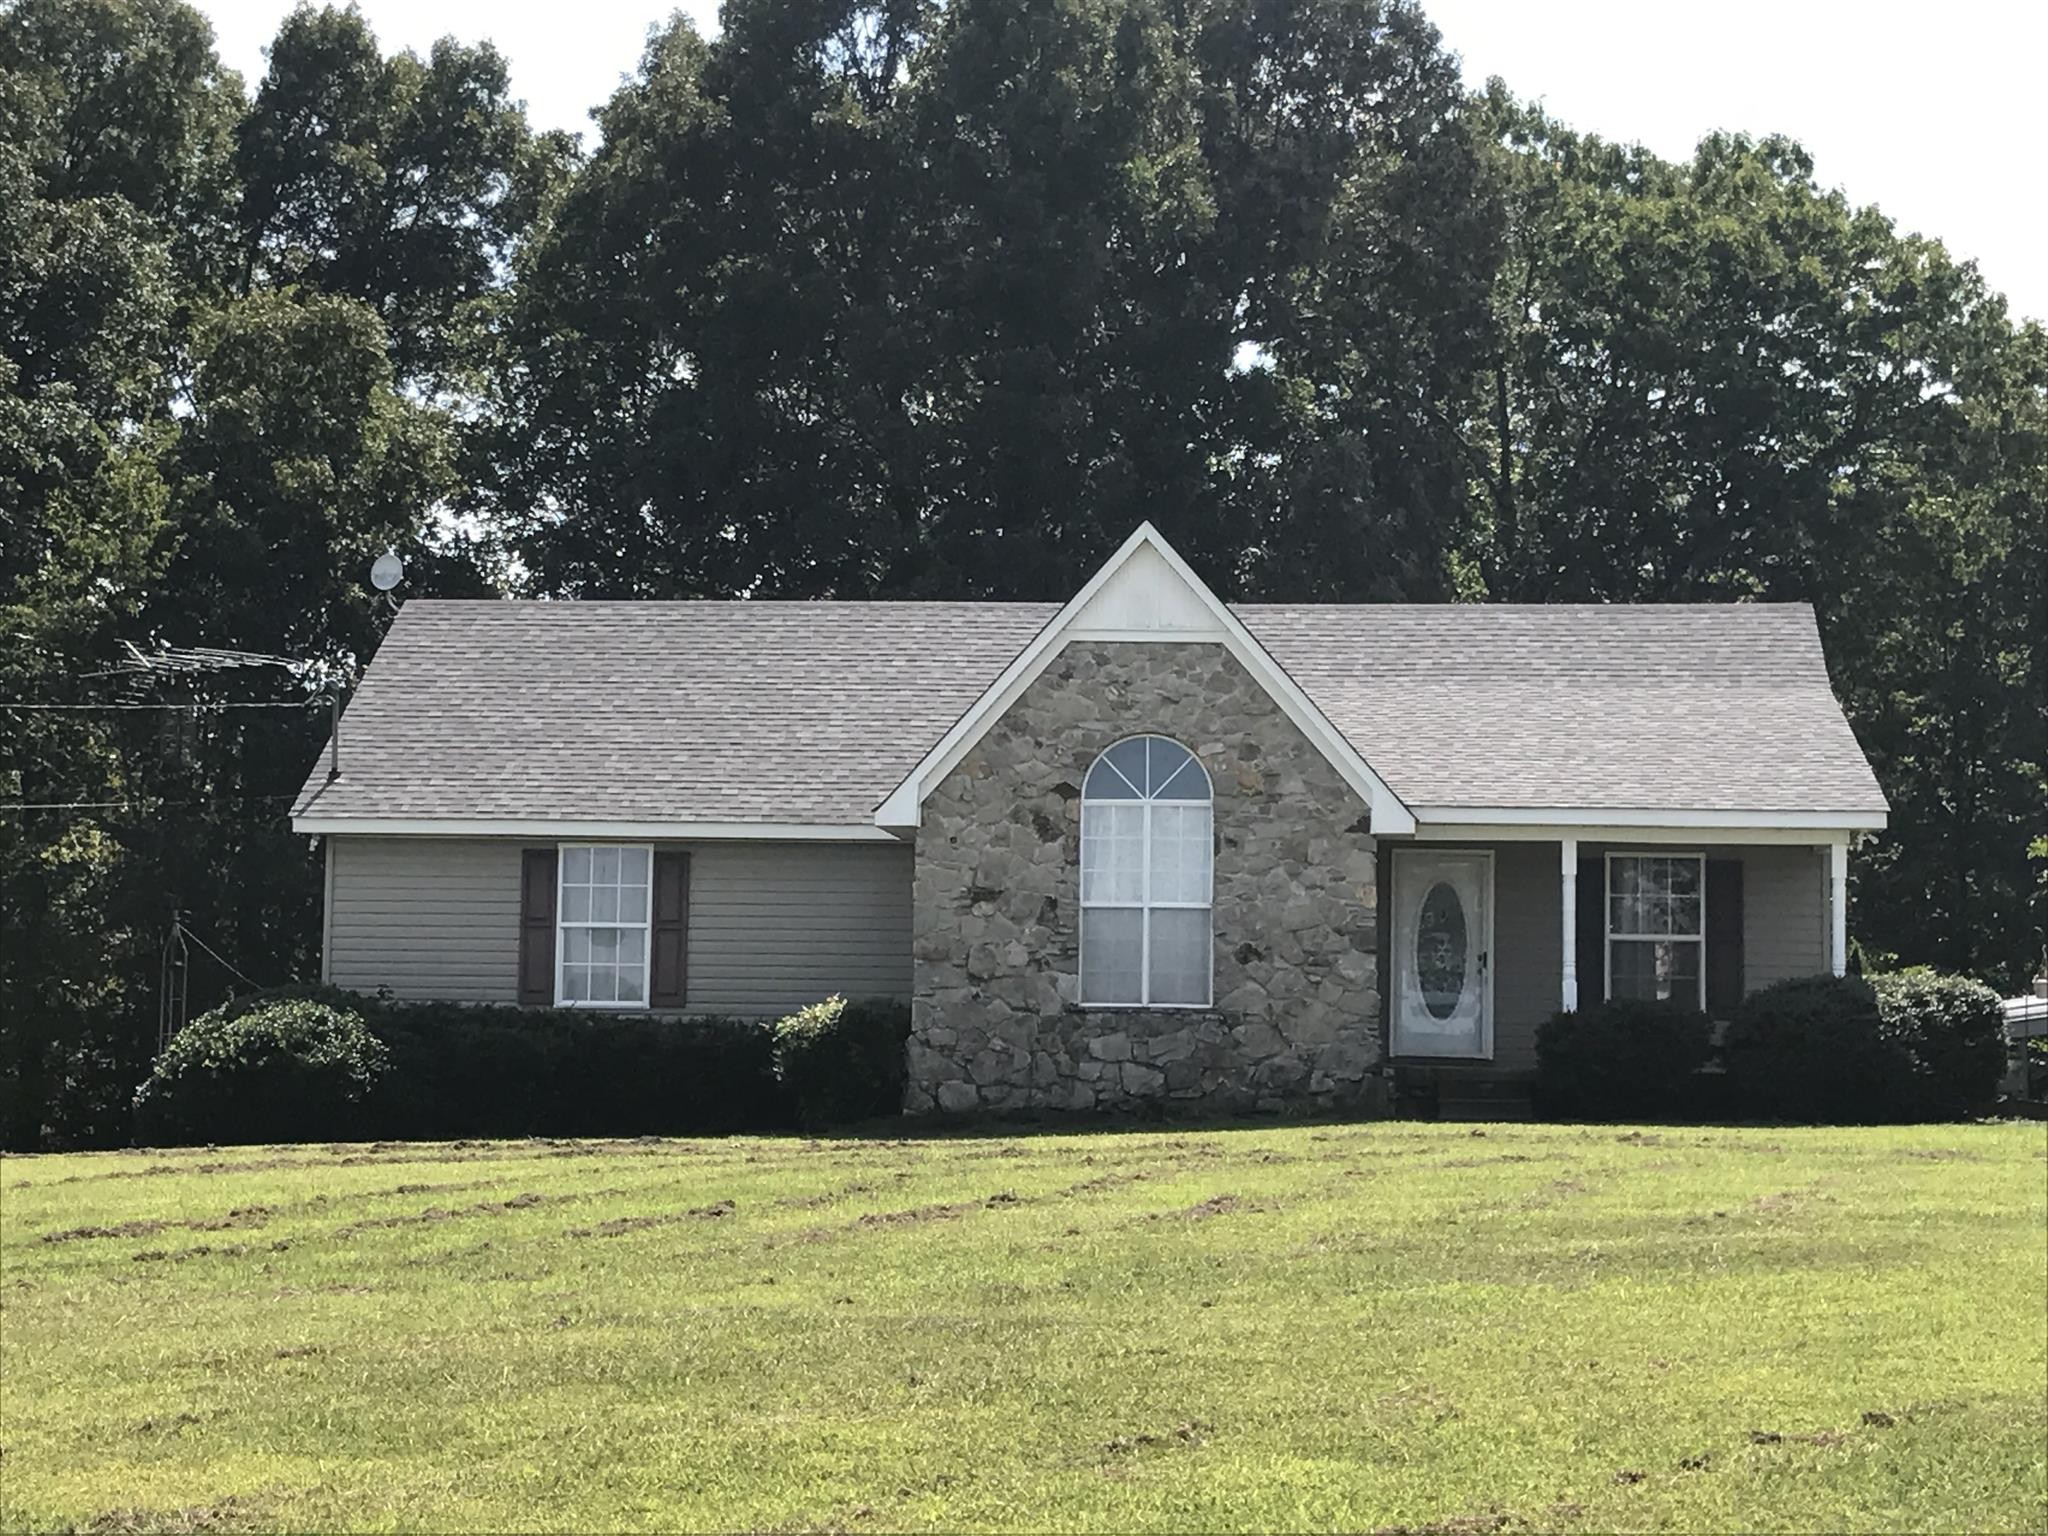 815 Knob Creek Rd Property Photo - Lawrenceburg, TN real estate listing